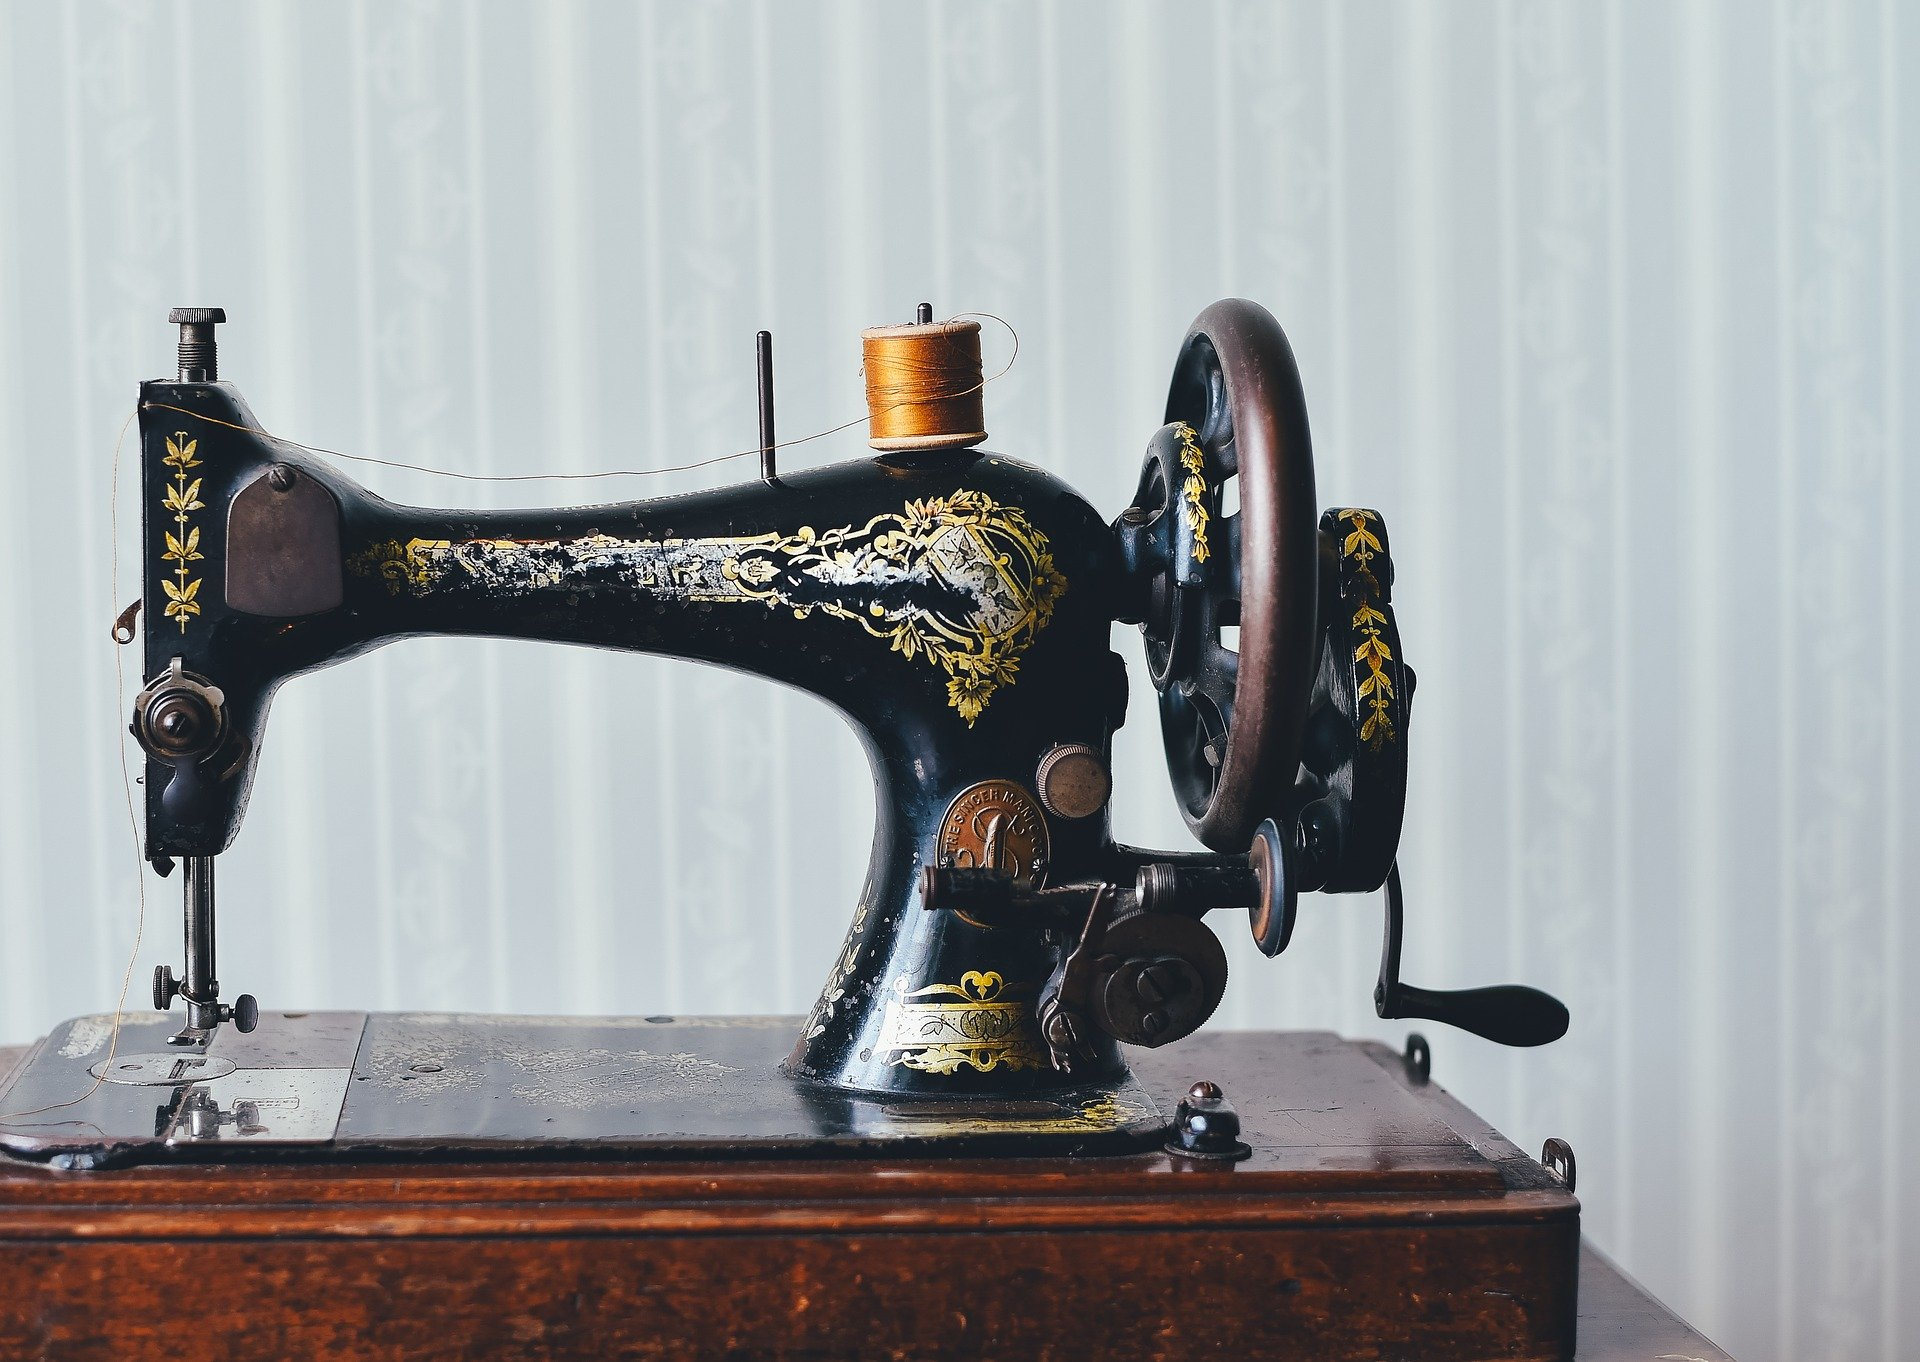 Koopr-Couture-Machine-PexelsFreePhotos-Pixabay